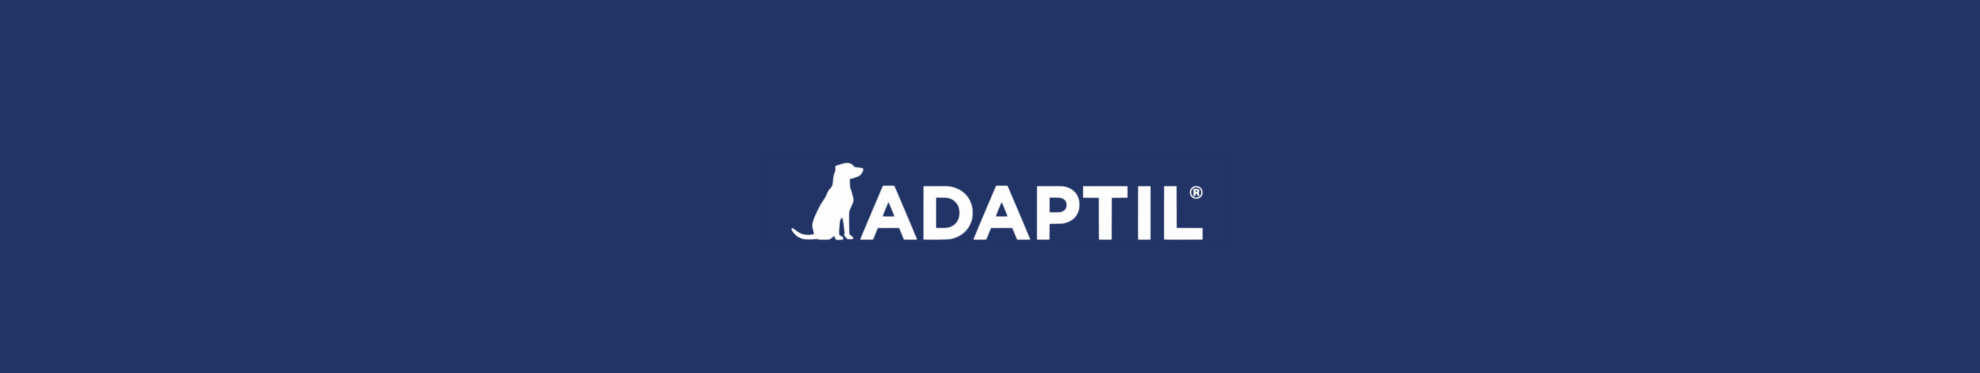 www.adaptil.com